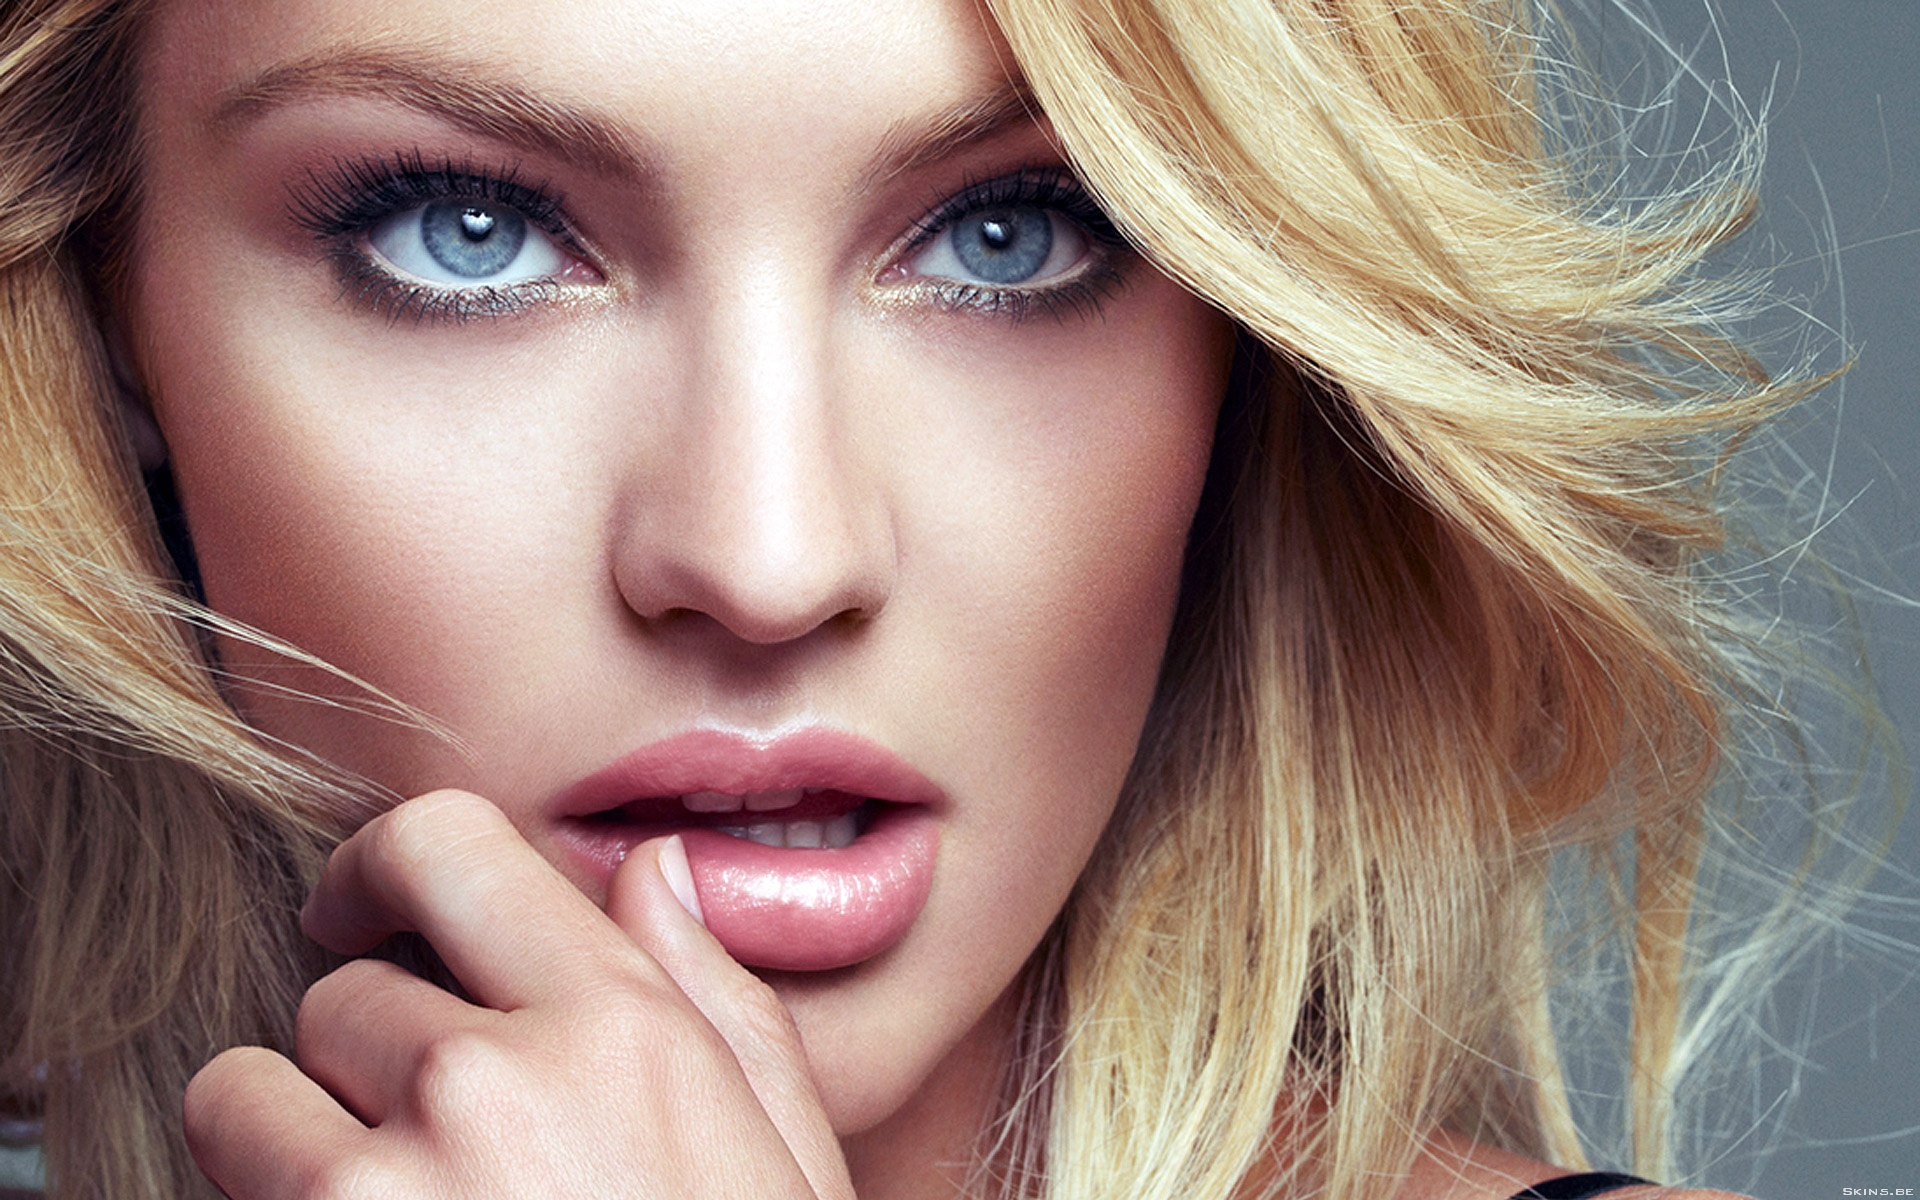 2013 09 02 Candice-Swanepoel-testimonial max factor 2013